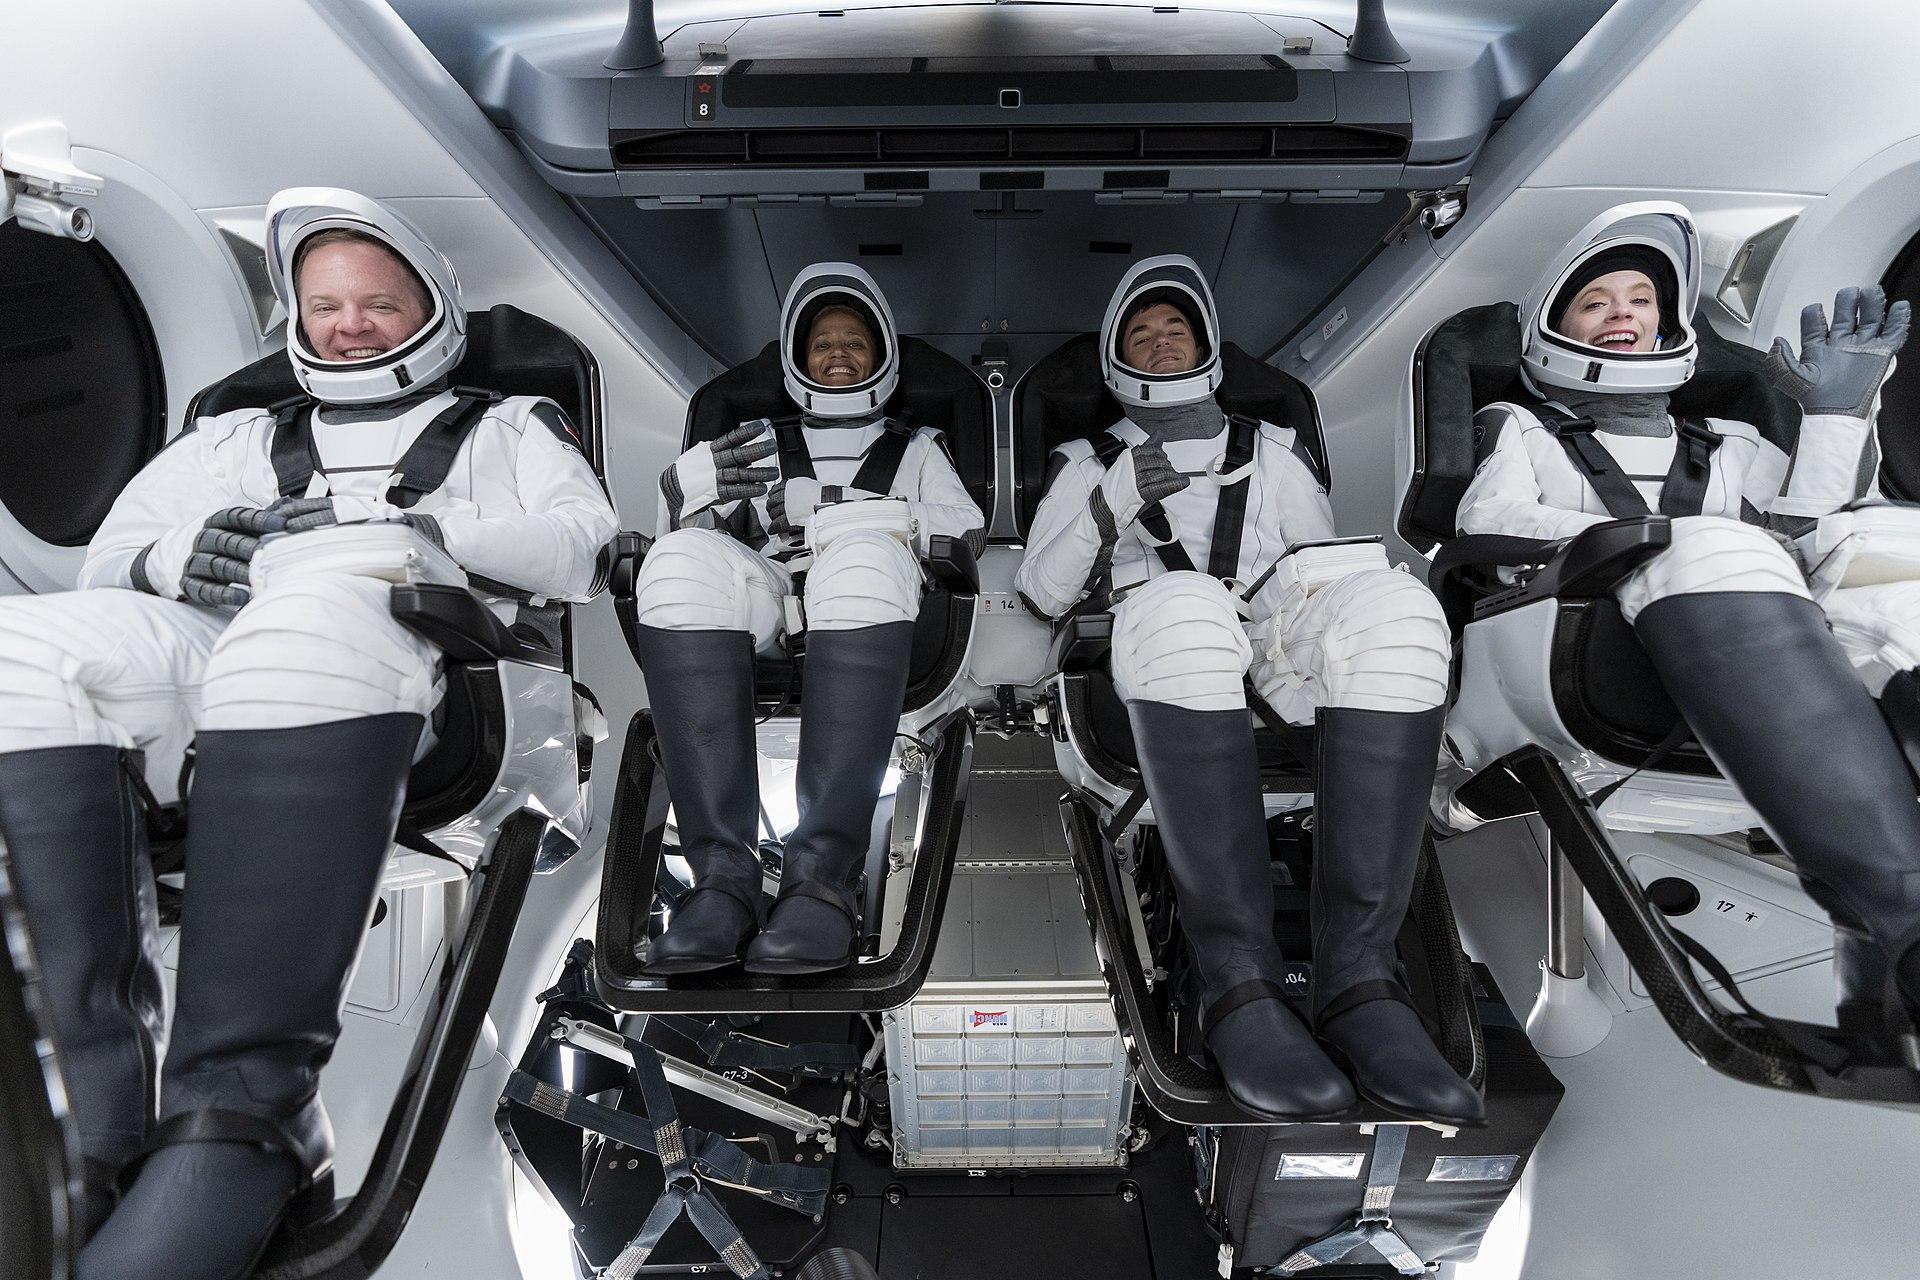 Экипаж <i>SpaceX Inspirati④n</i>.